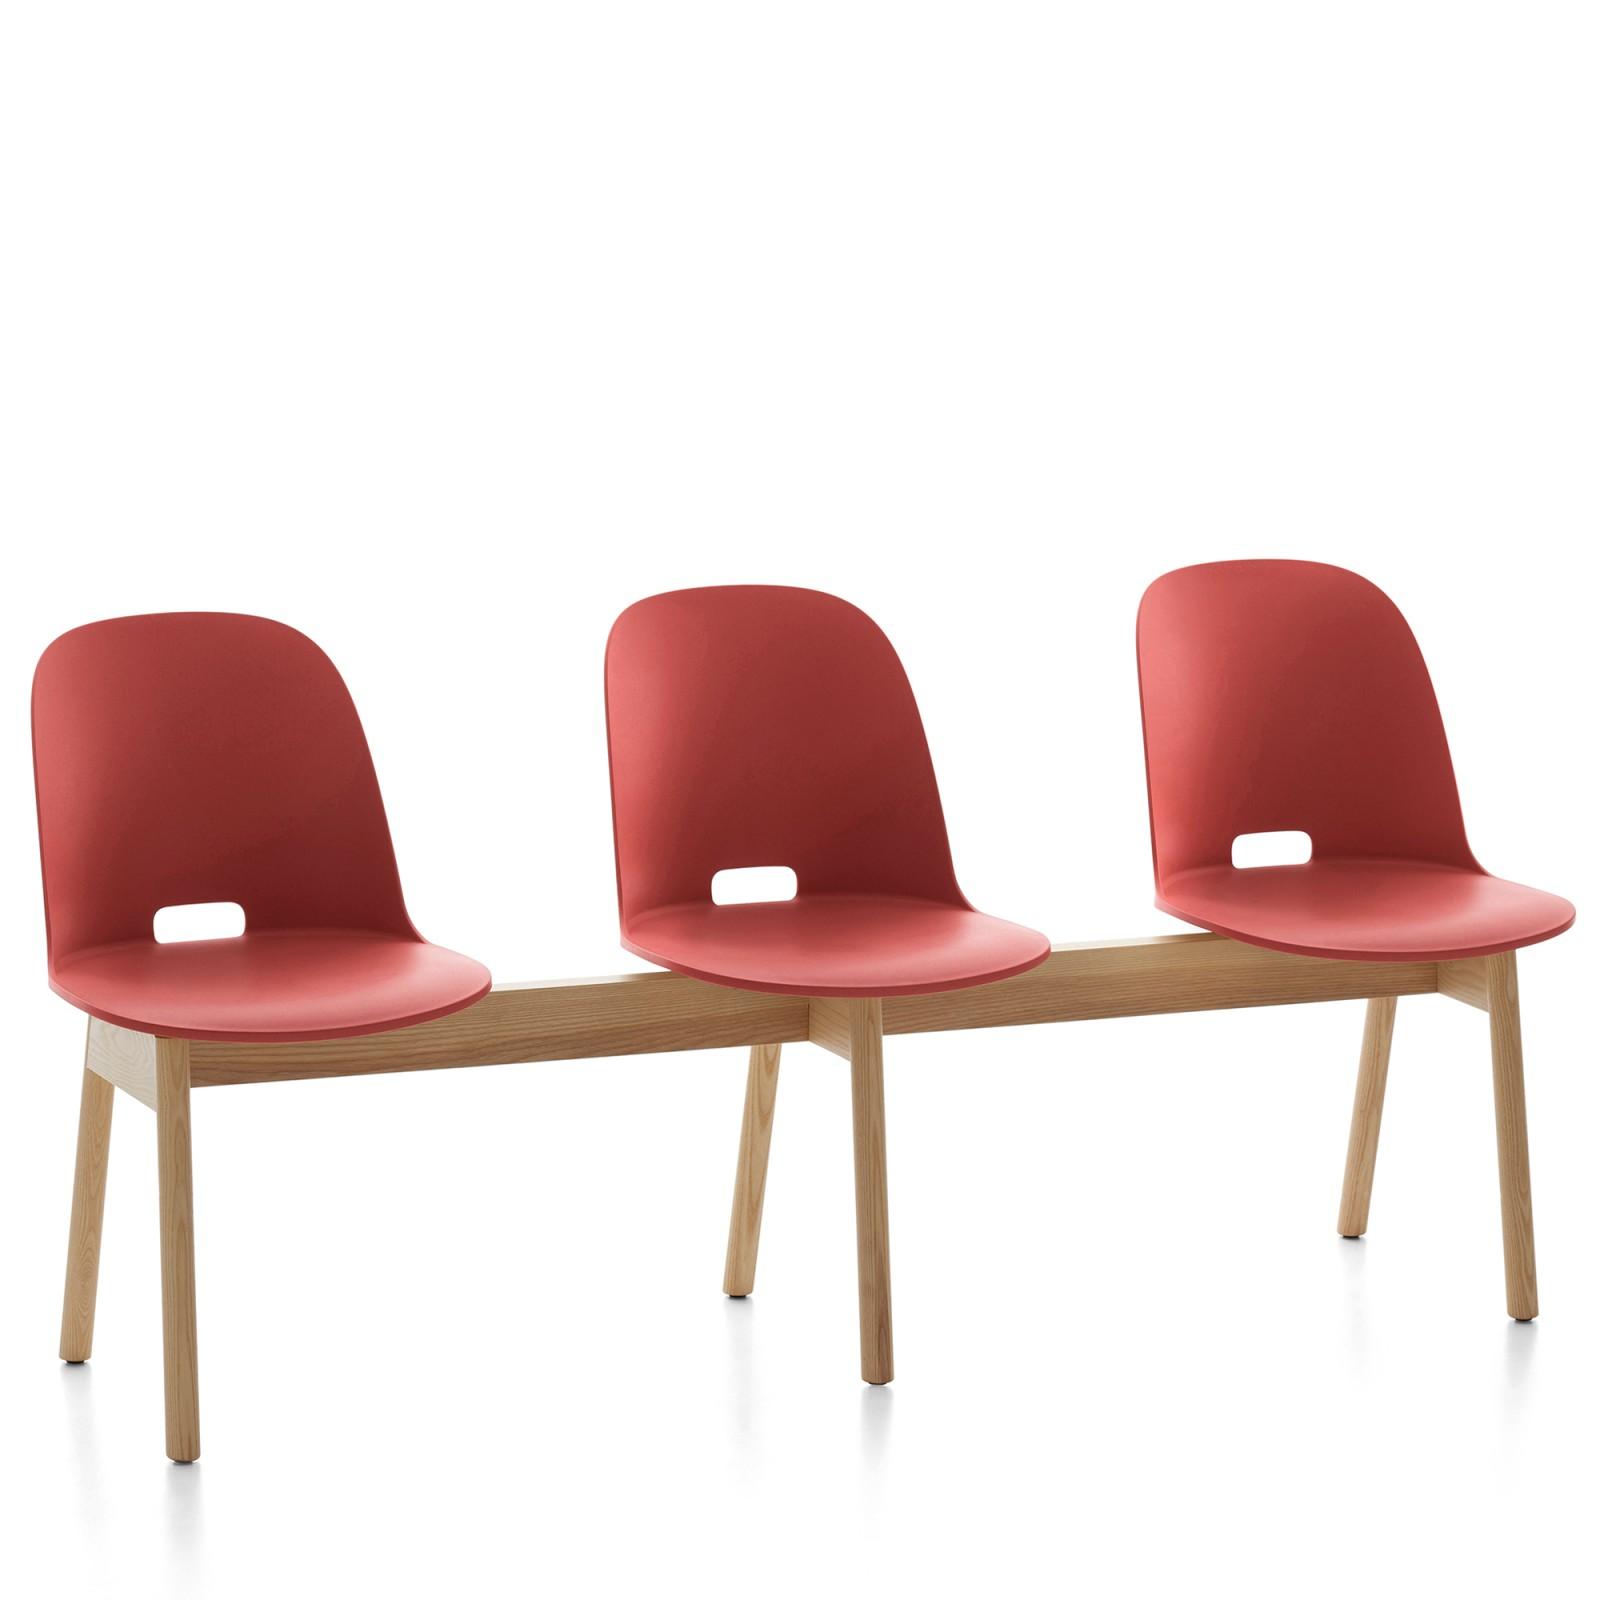 Alfi 3 Seater Bench, High Back Red, Natural Light Ash Frame